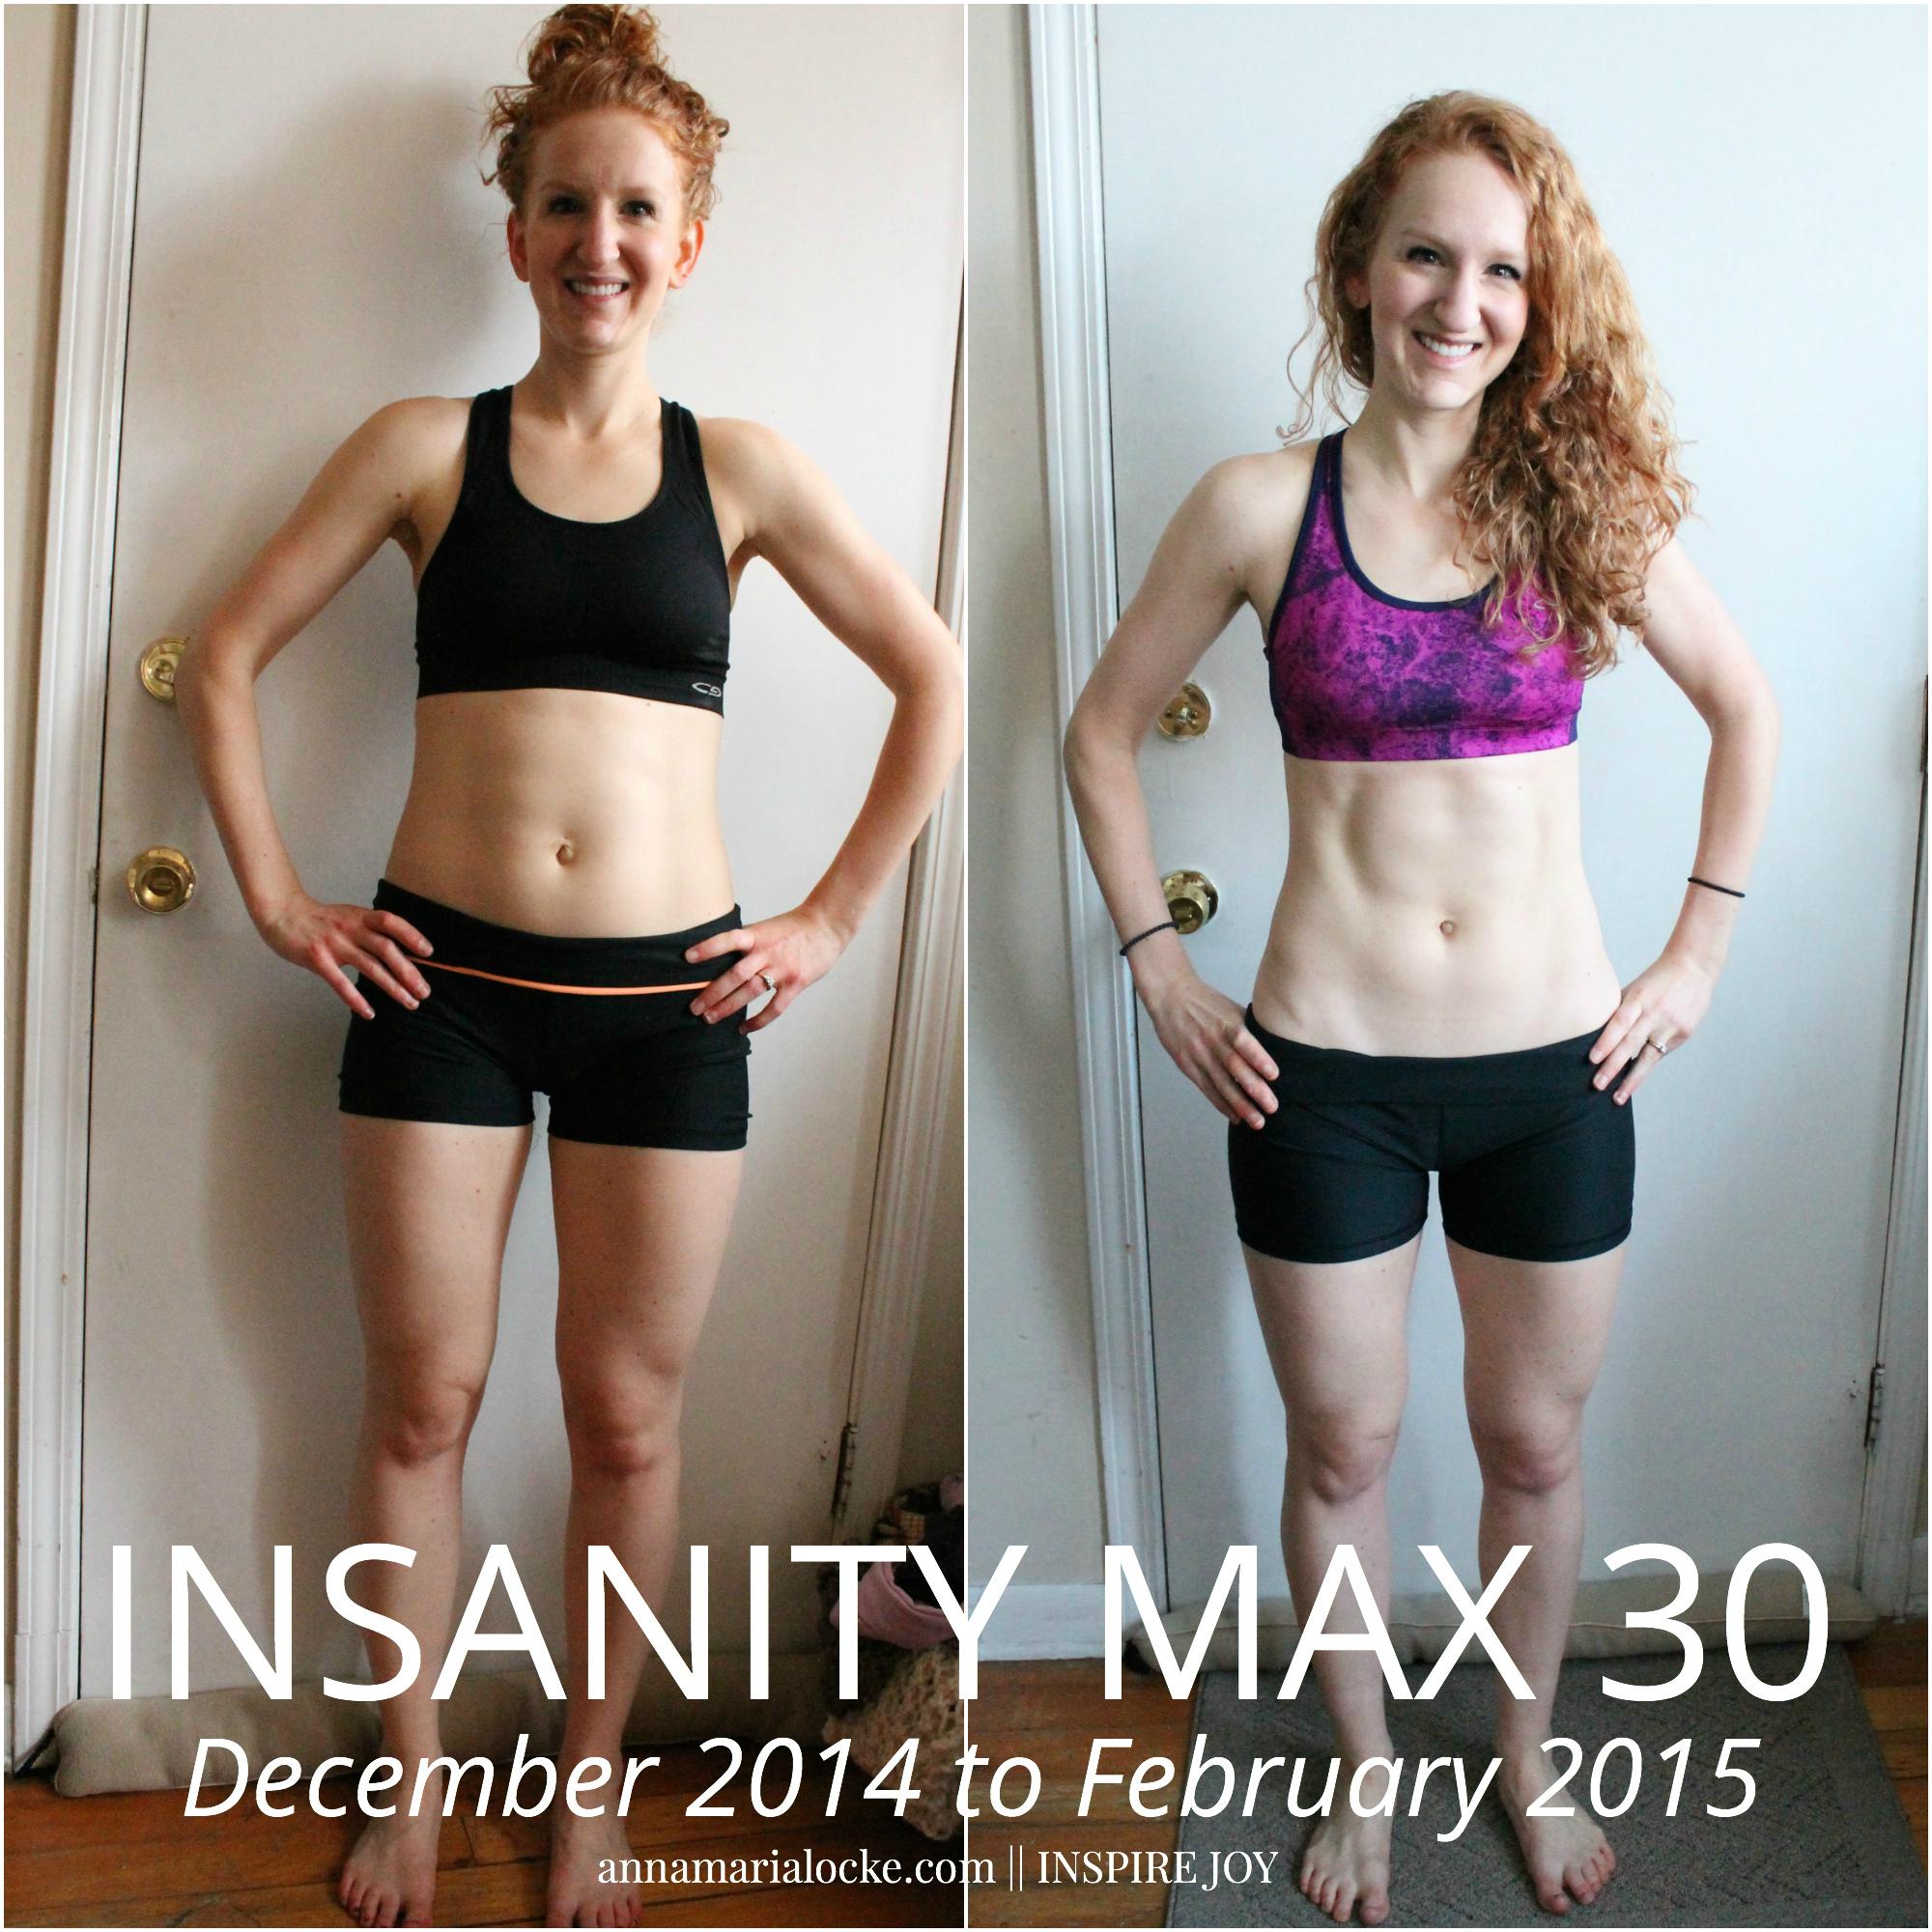 insanity-max-30-review.jpg